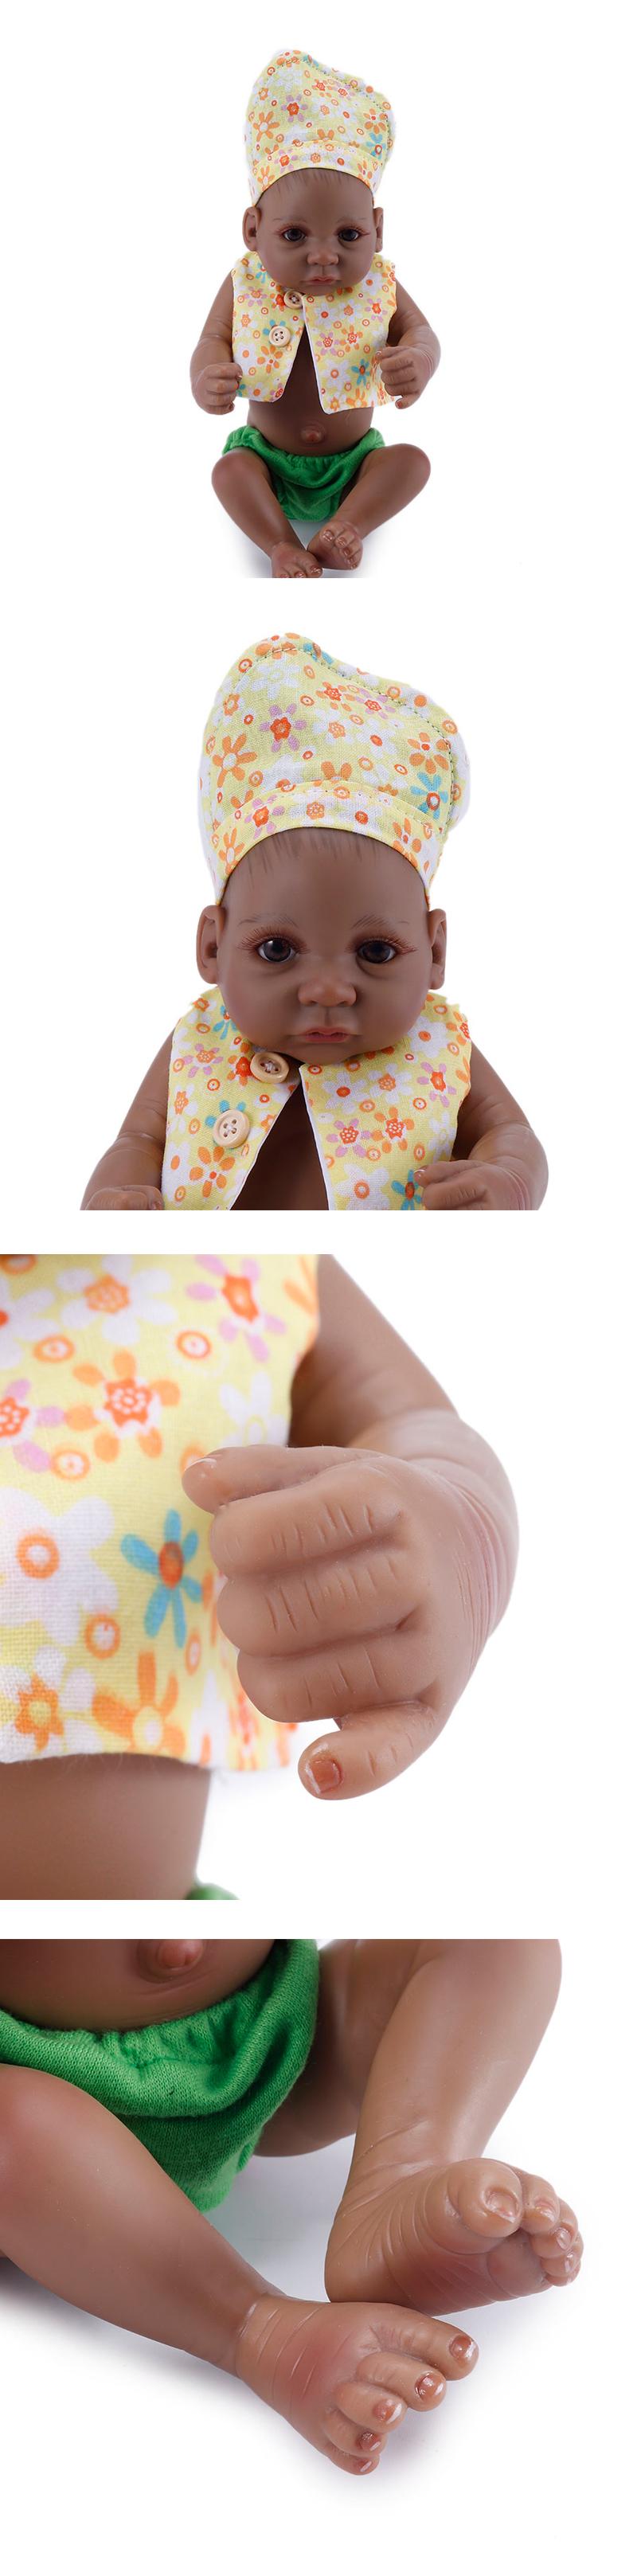 NPK 10 Inch 27cm Black Reborn Baby Soft Silicone Doll Handmade Lifelike Baby Girl Dolls Play House Toys Birthday Gift